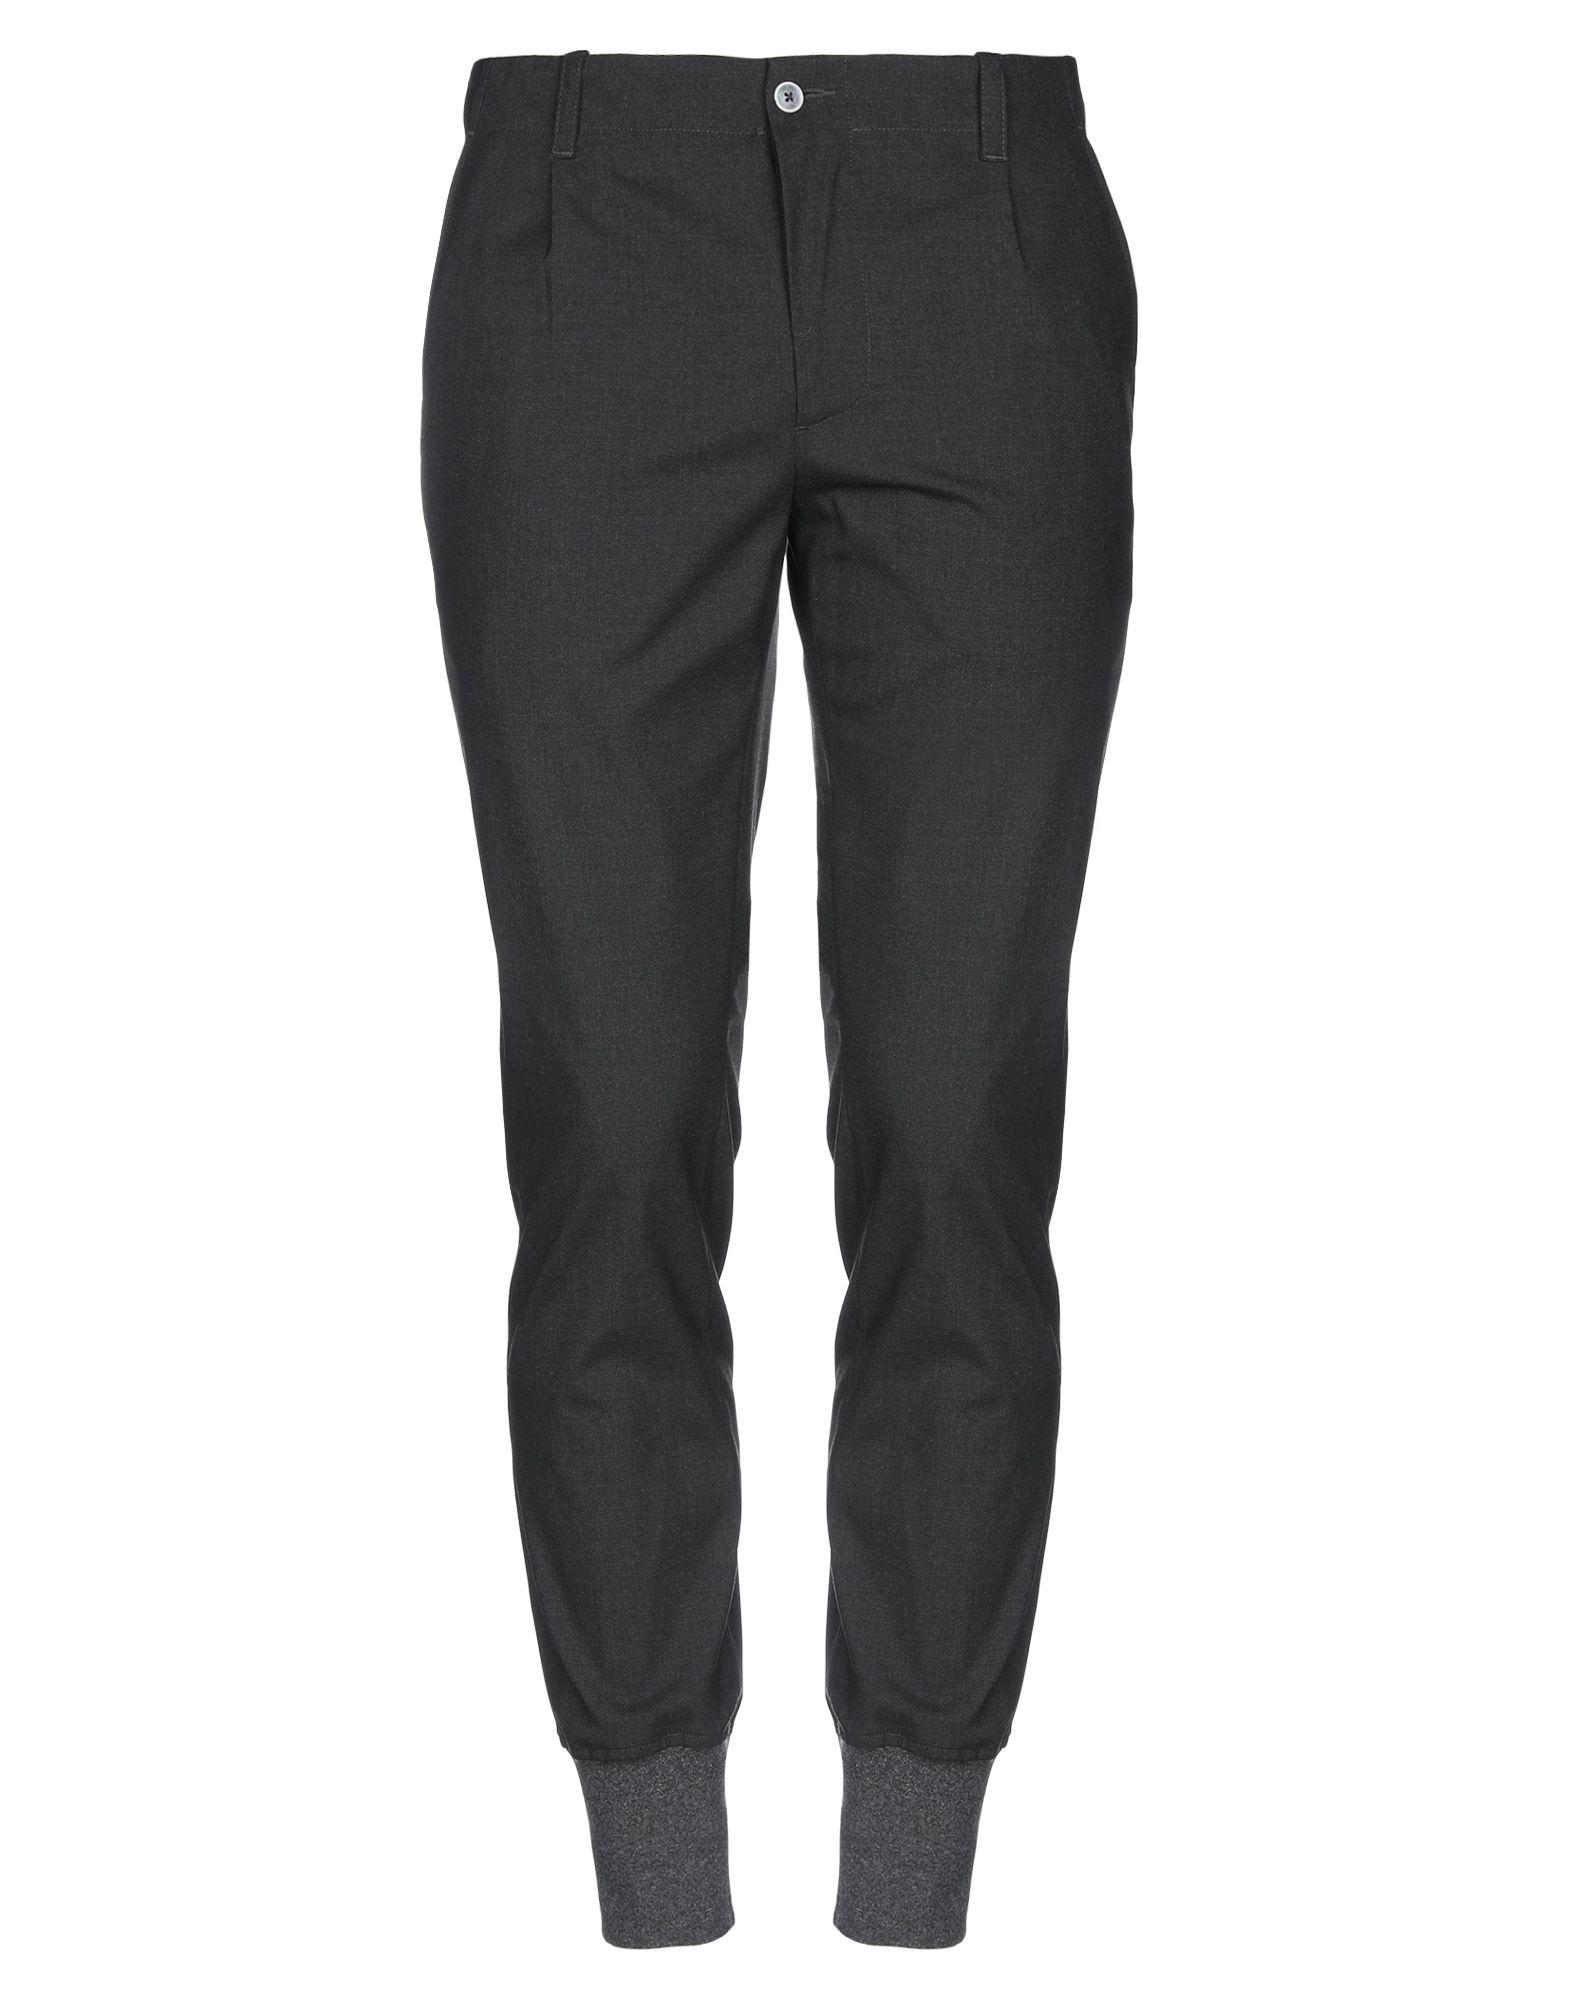 Pantalone grigio grigio Daniele Alessandrini uomo - 13368144IO